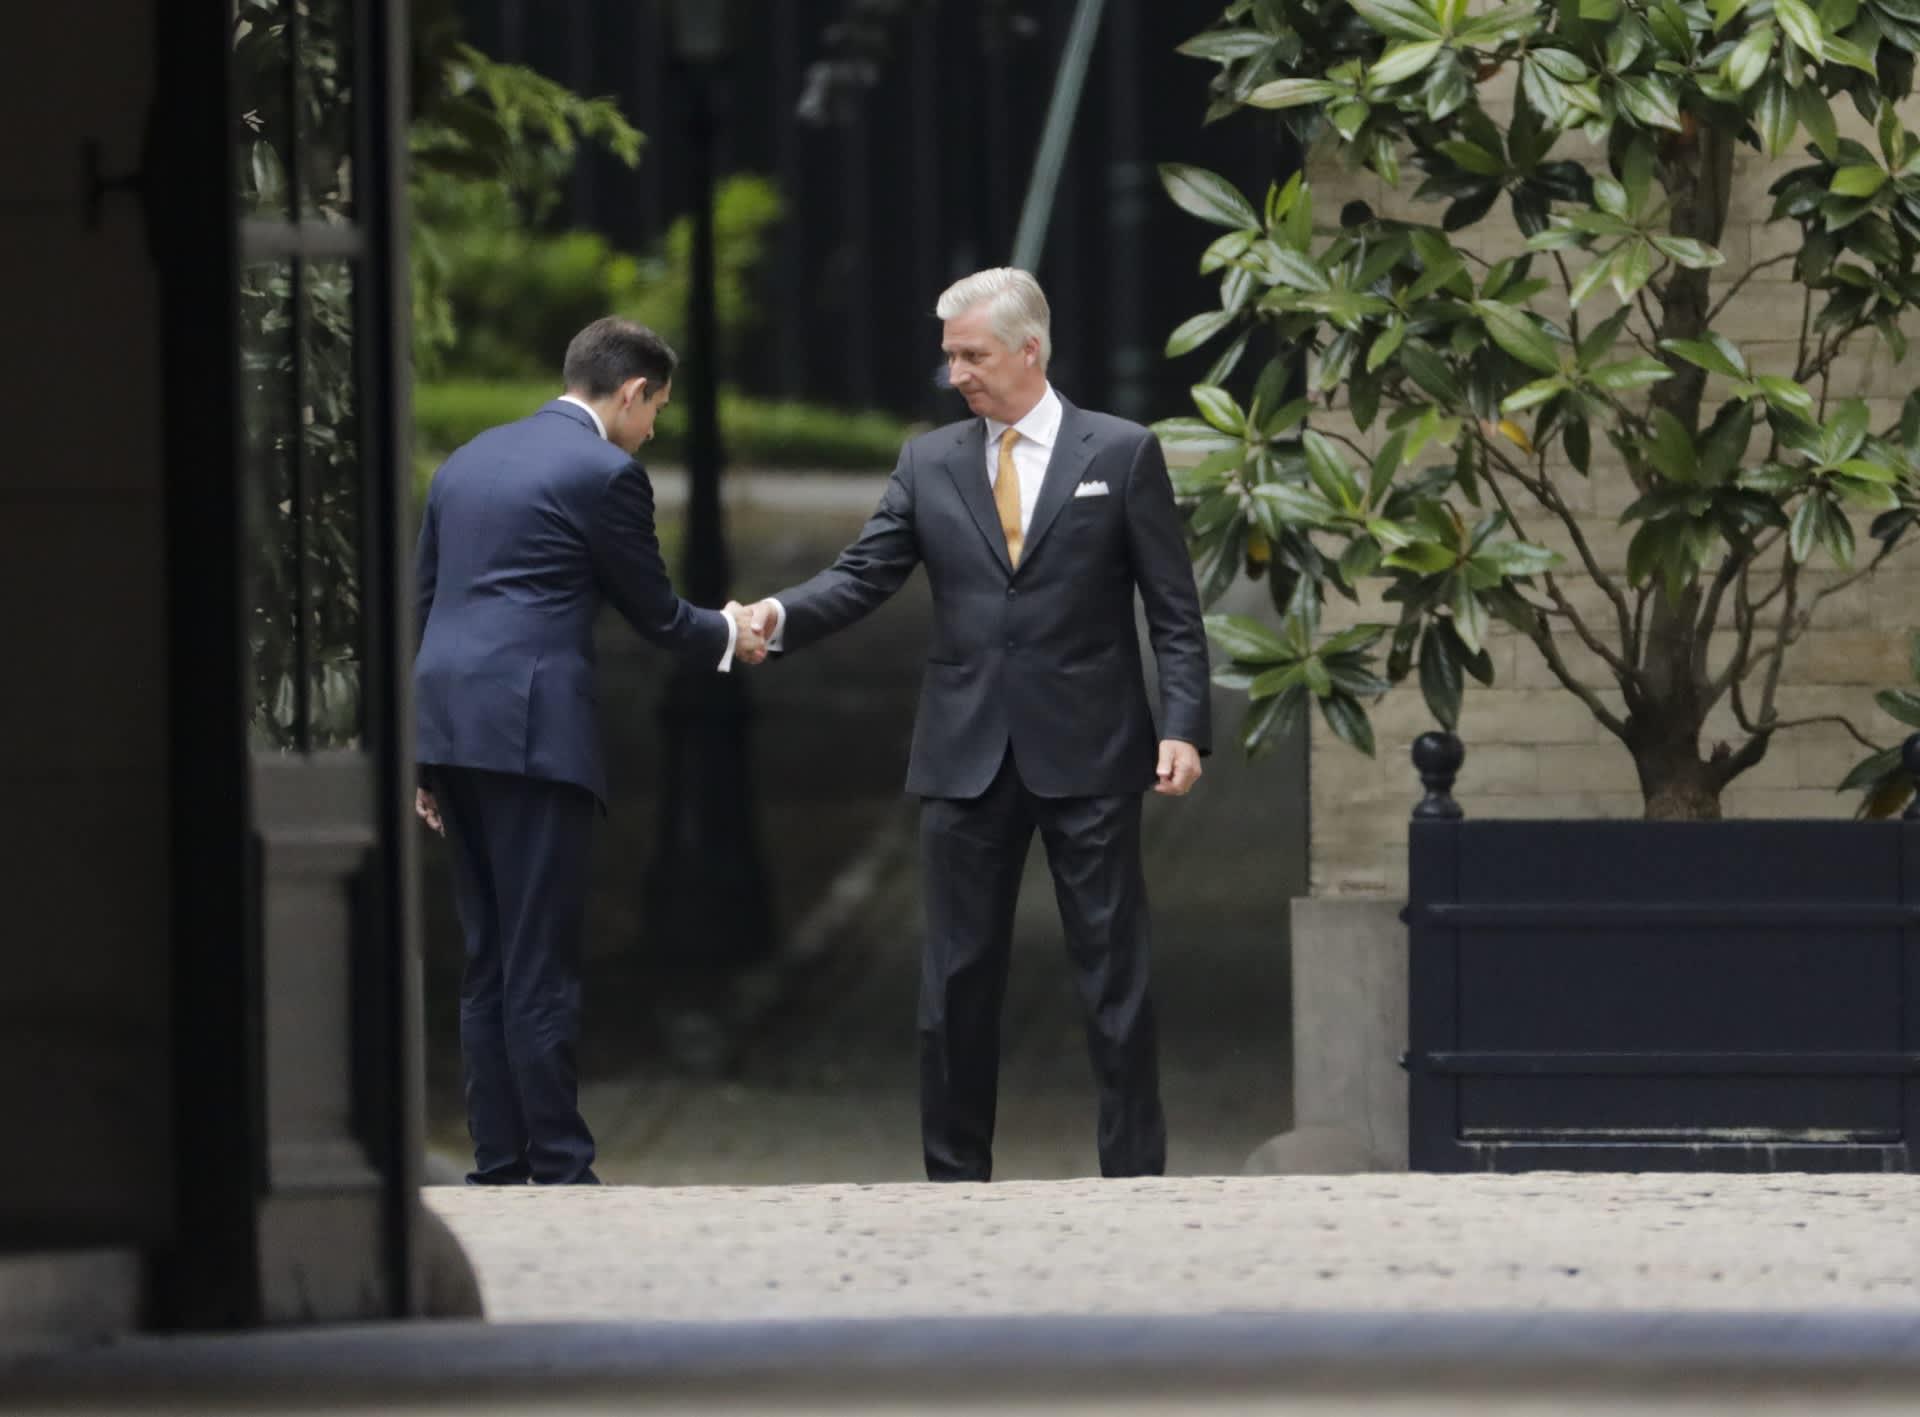 Kuningas Philippe kättelee Tom Van Griekeniä.